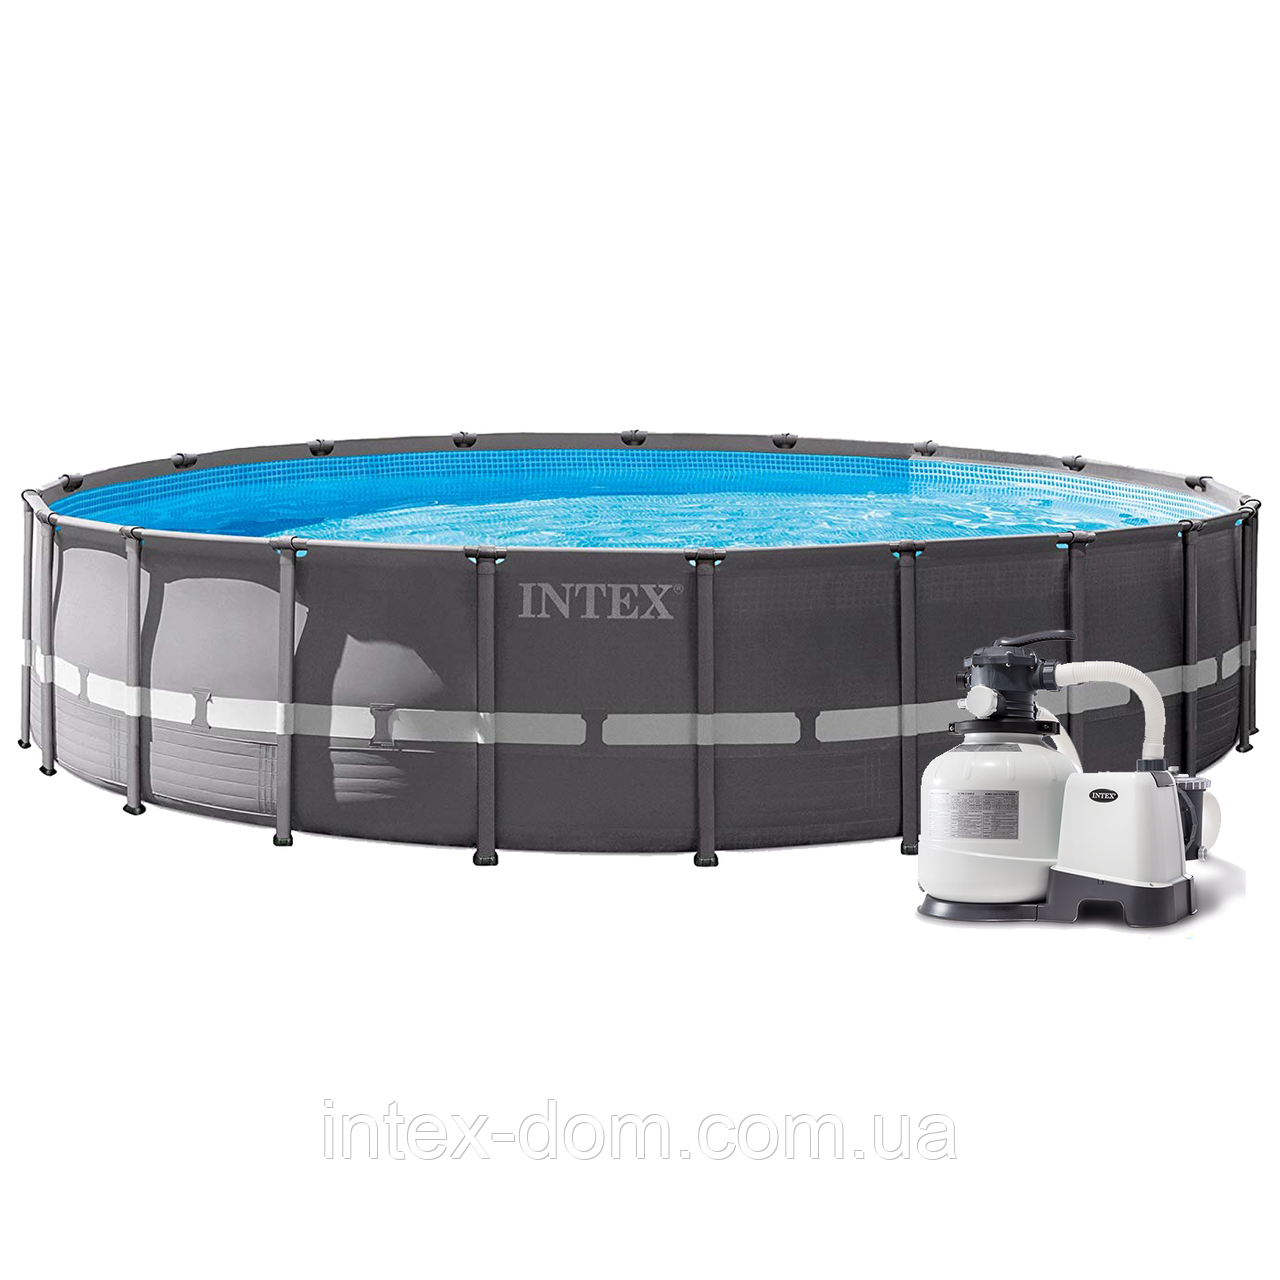 Intex 26334 - каркасный бассейн Ultra Frame XTR ( 610x122 см )